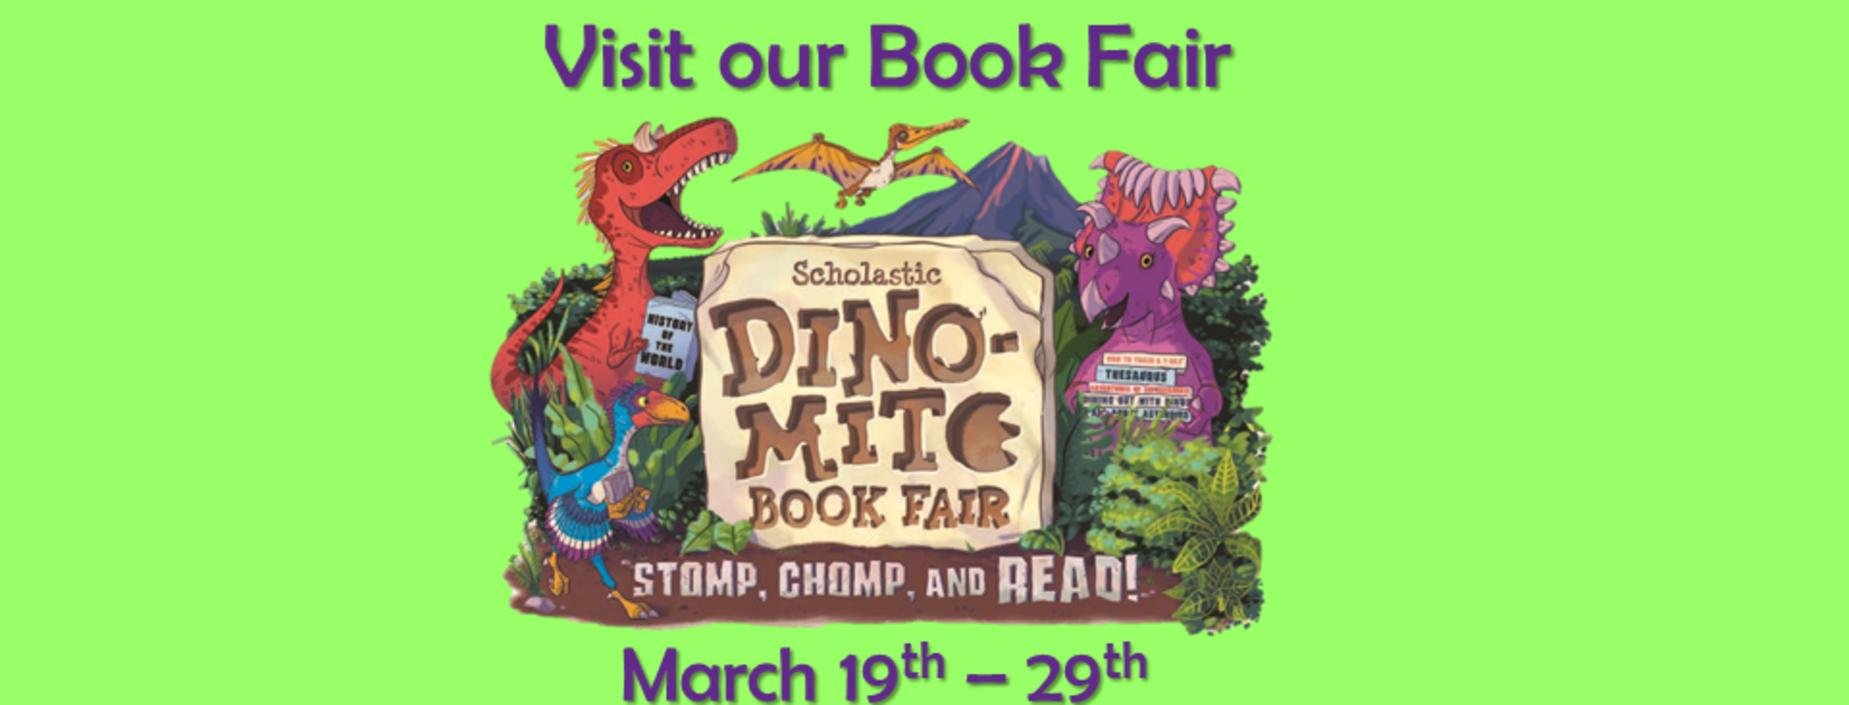 picture of book fair announcement